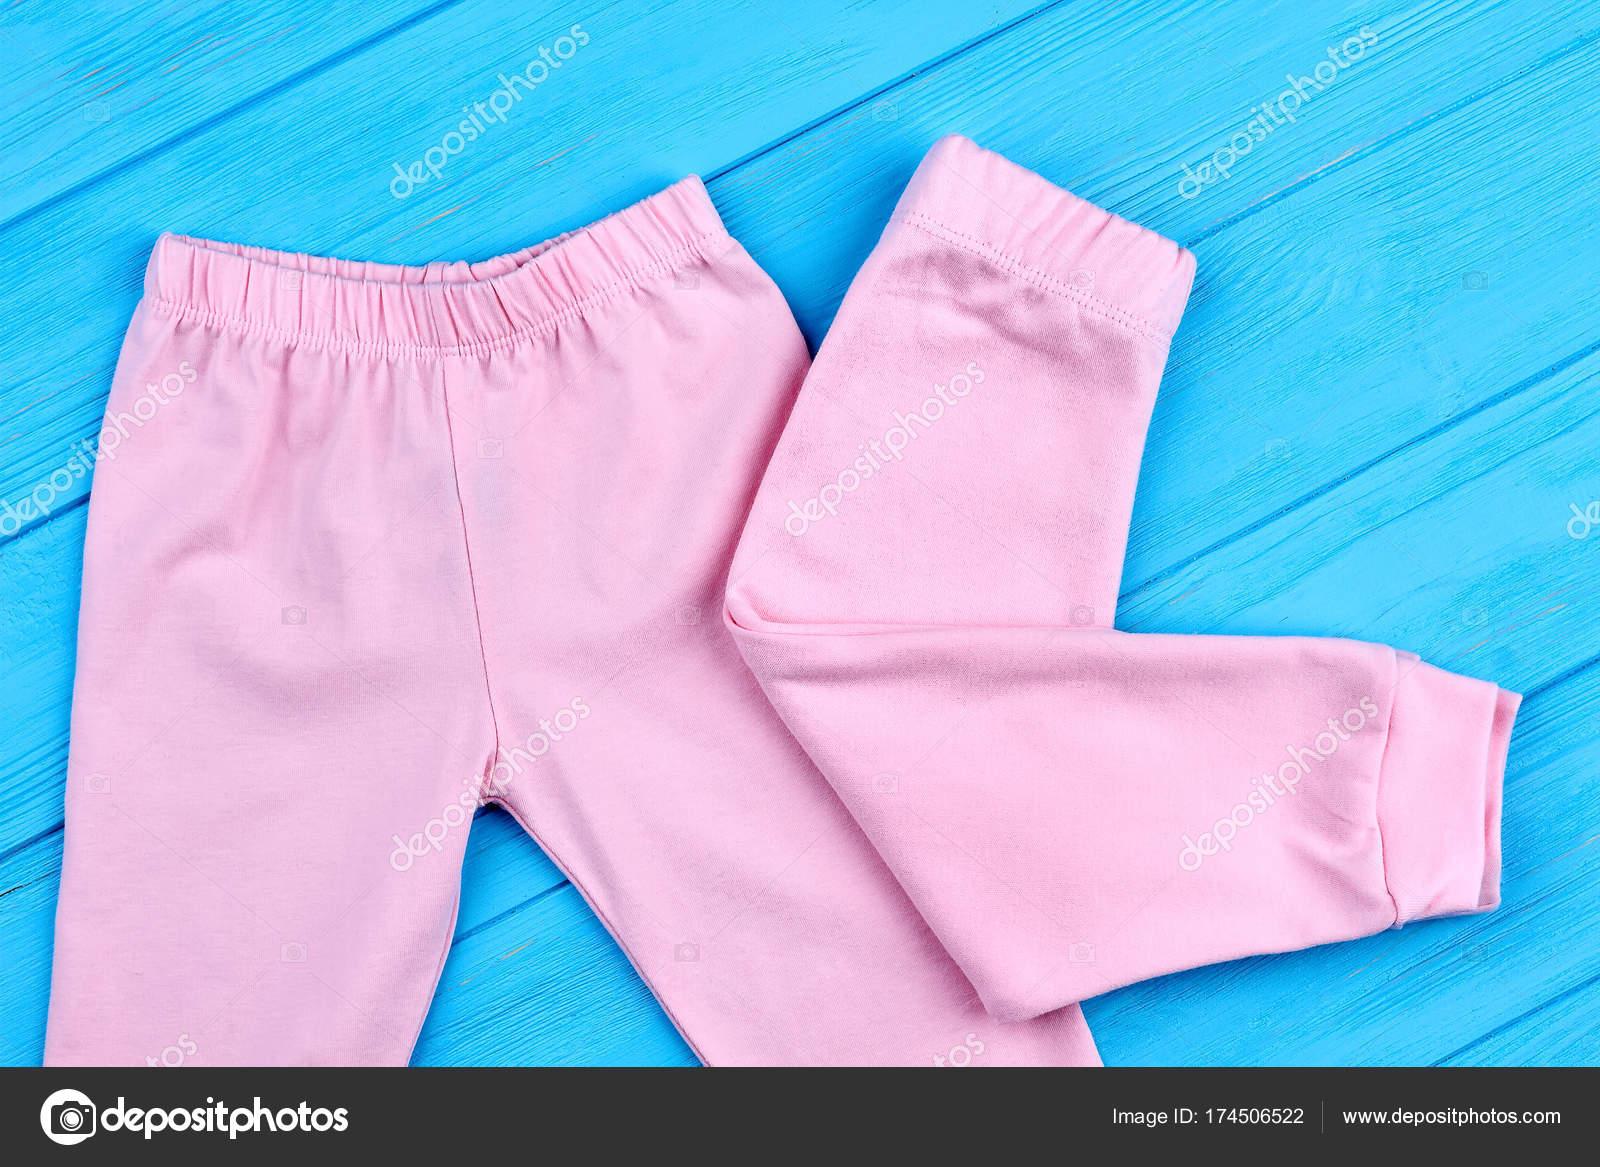 f4d4e881c Moda pantalones color rosa para las niñas. Polainas naturales suaves para  bebés niñas